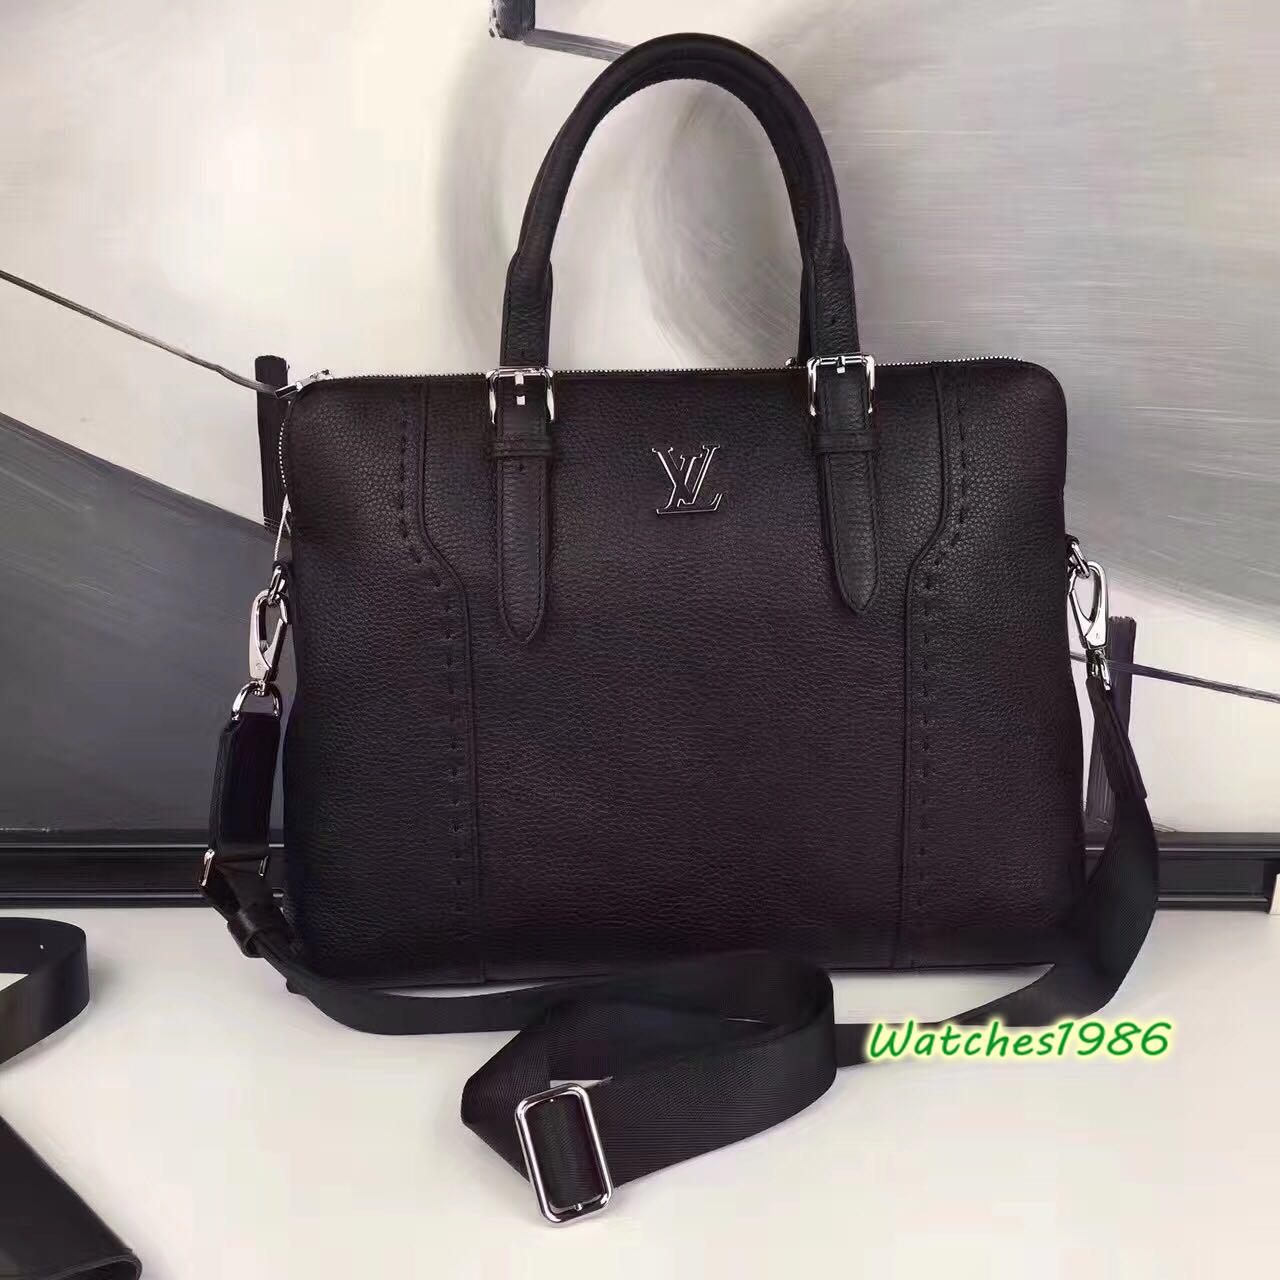 Replica handbags online Louis Vuitton Business Bags